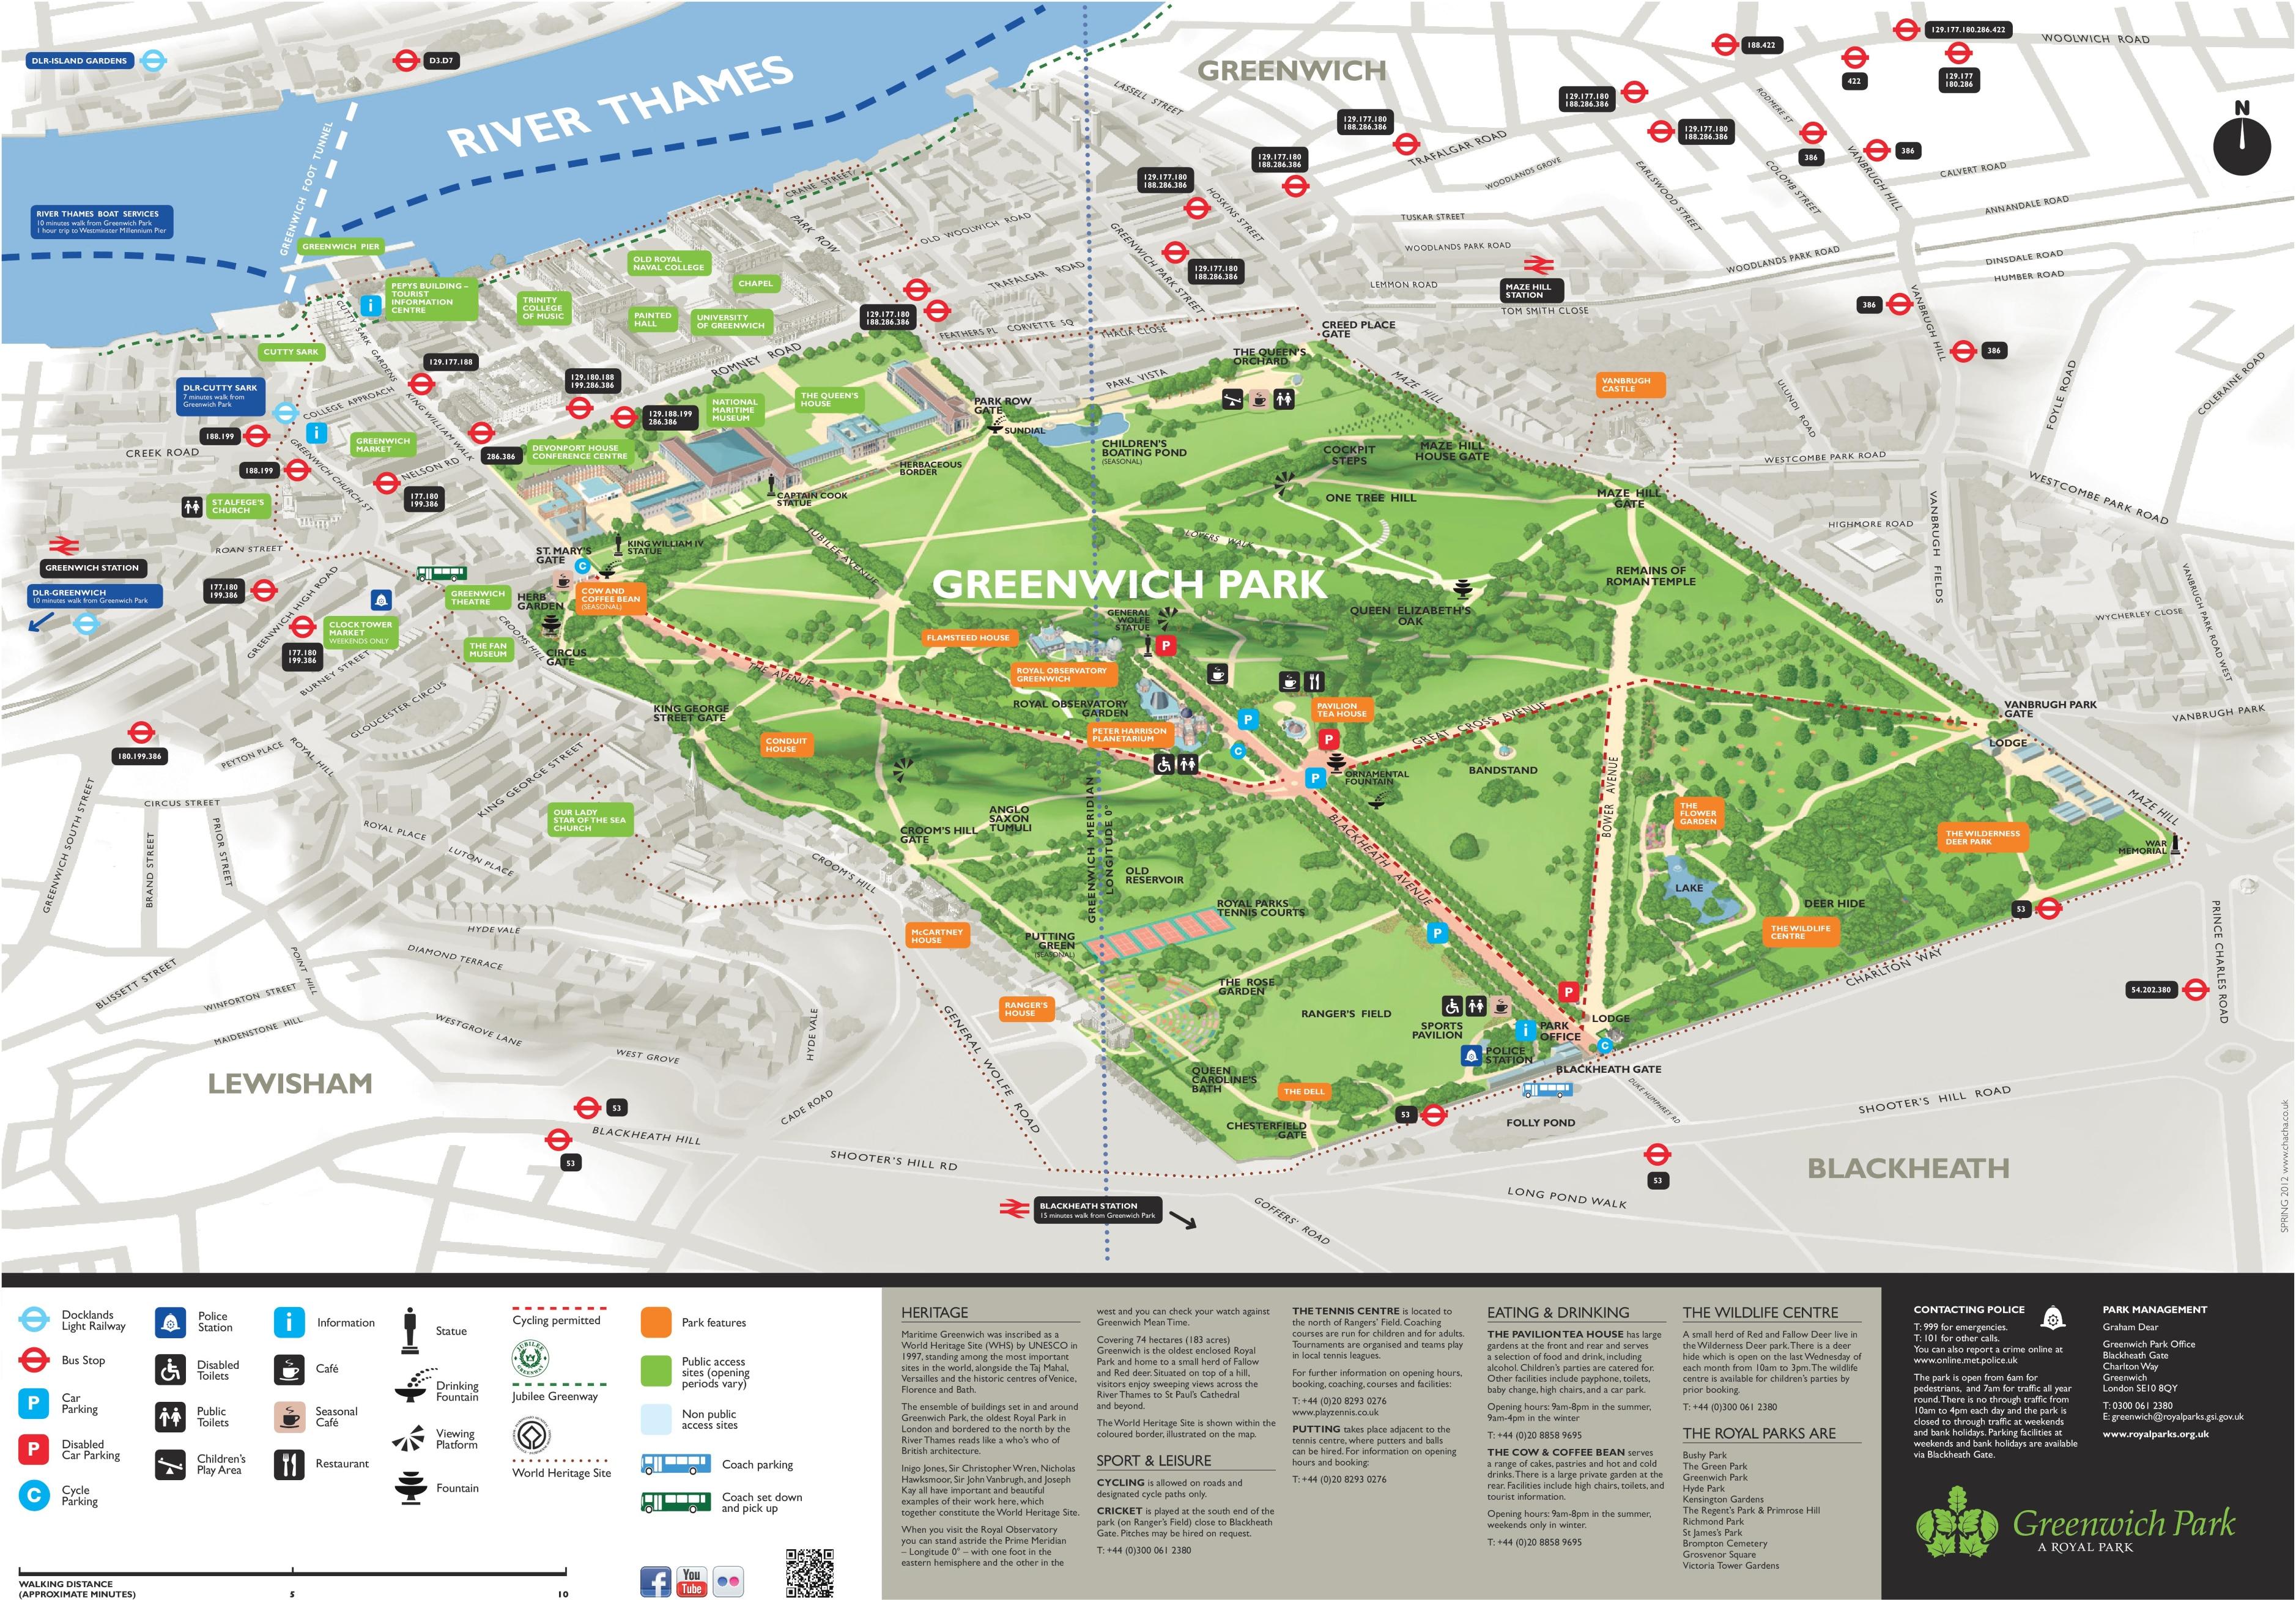 Greenwich Park Map Greenwich Park map